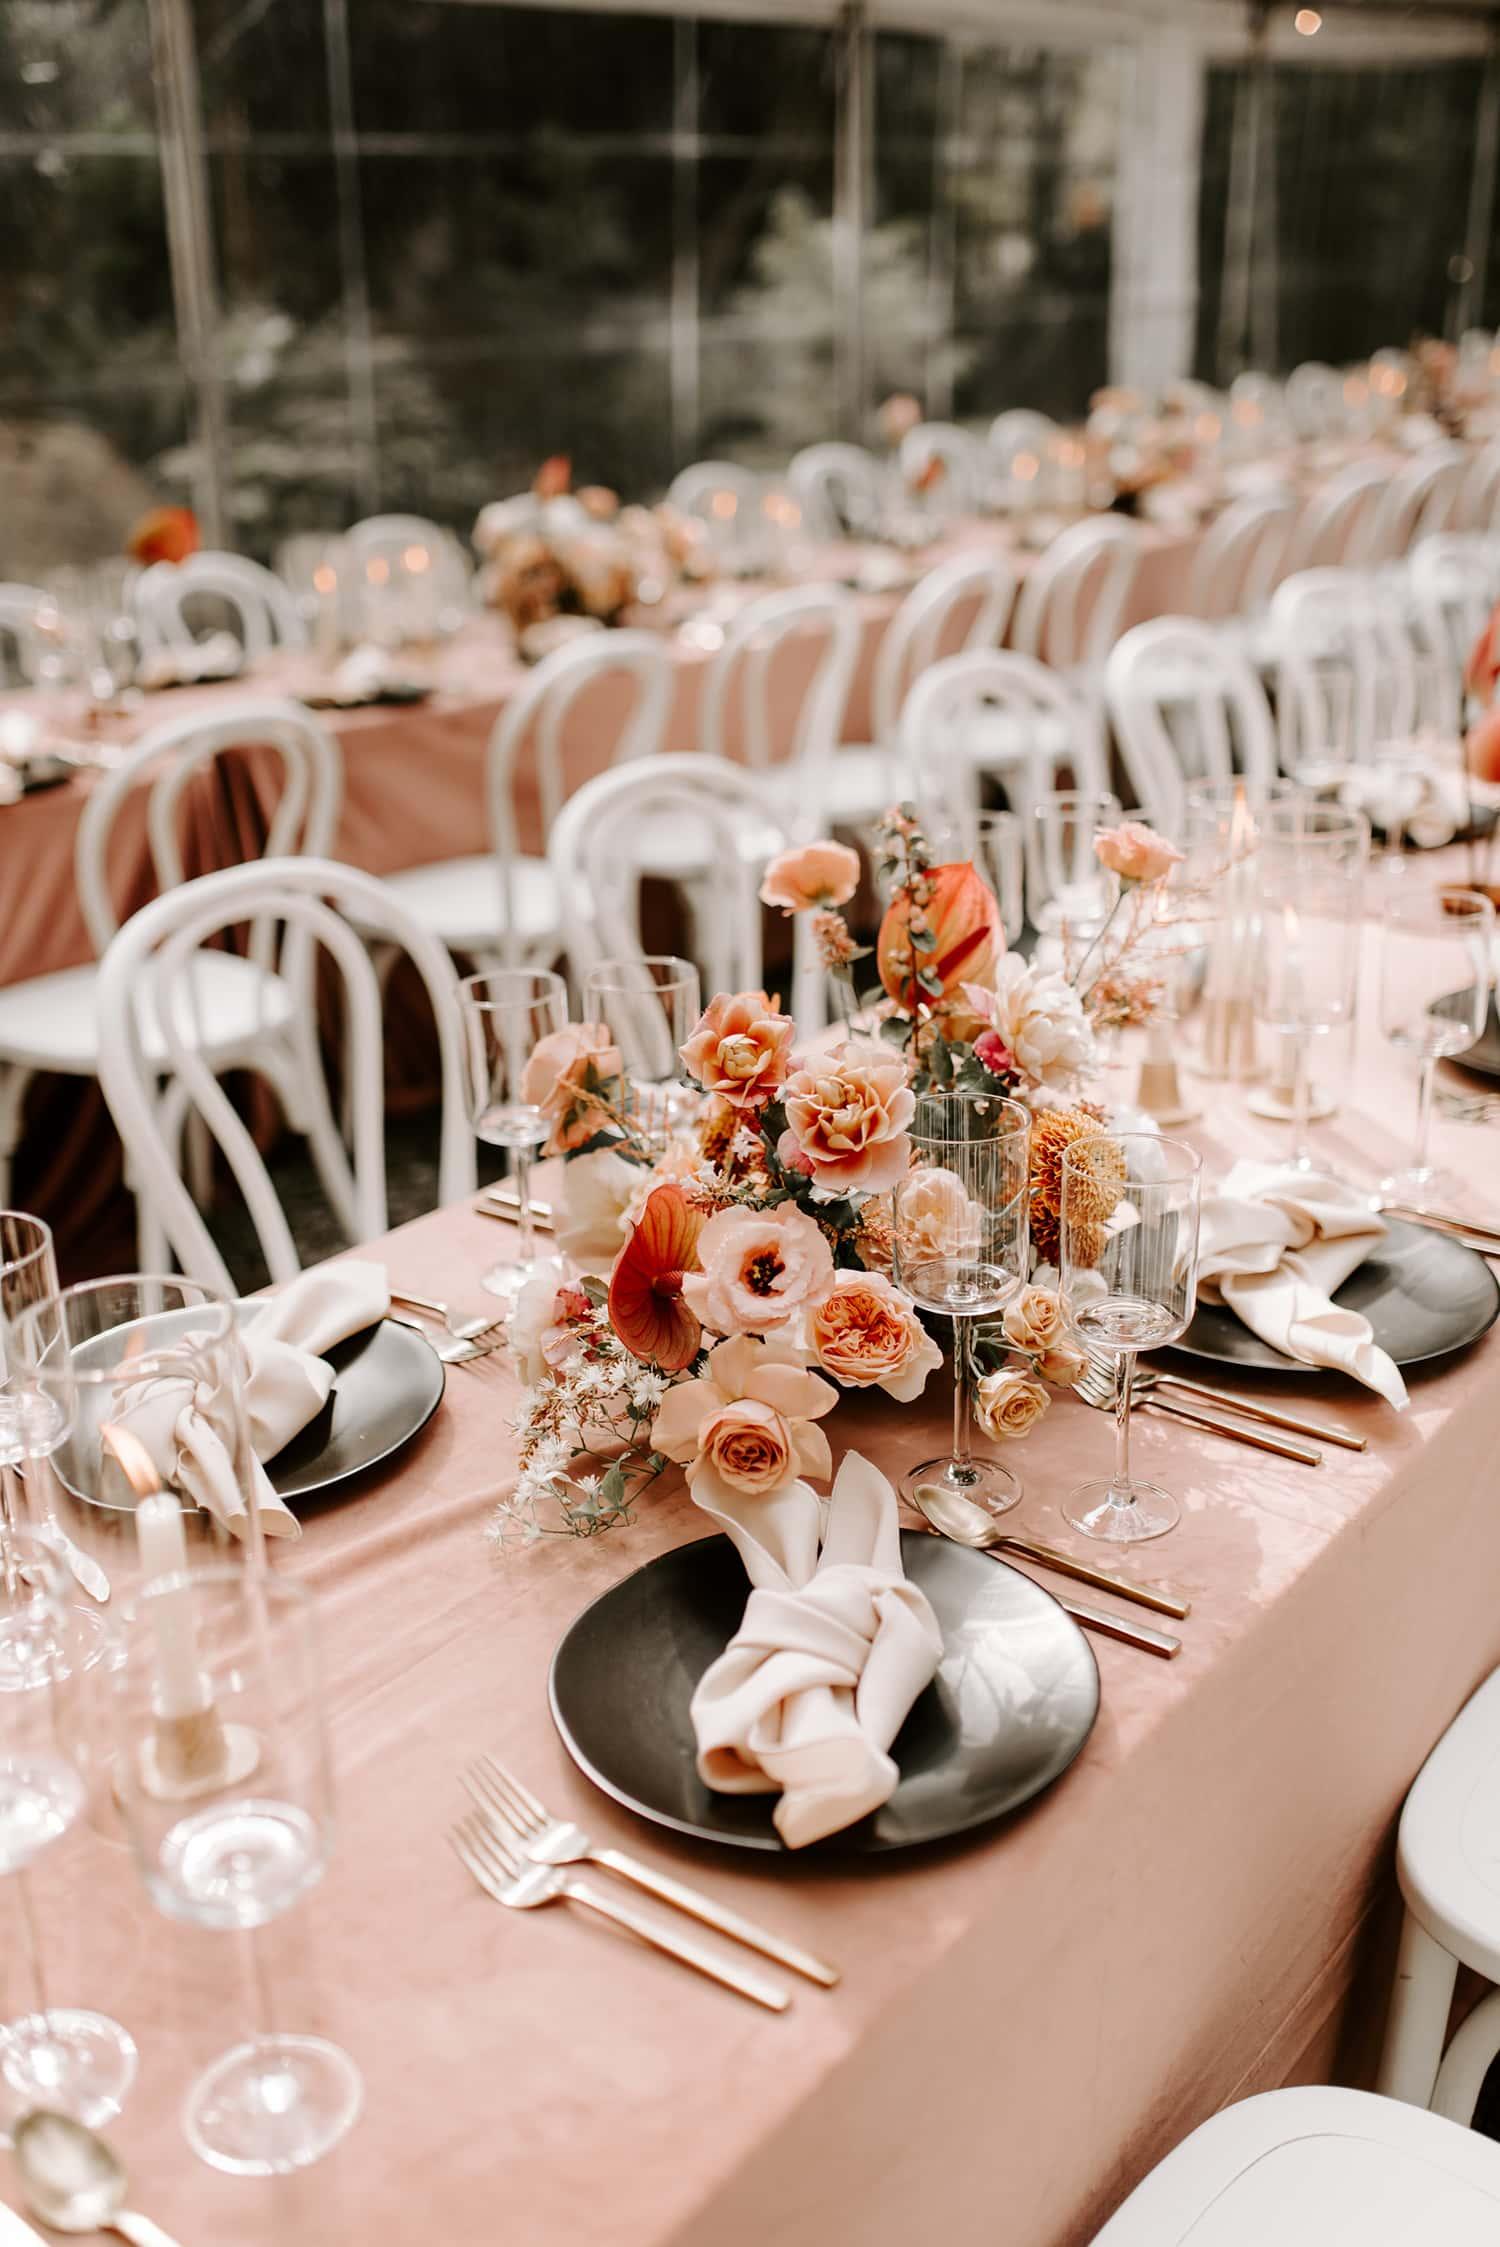 Copy of Elegant Centerpiece on wedding table